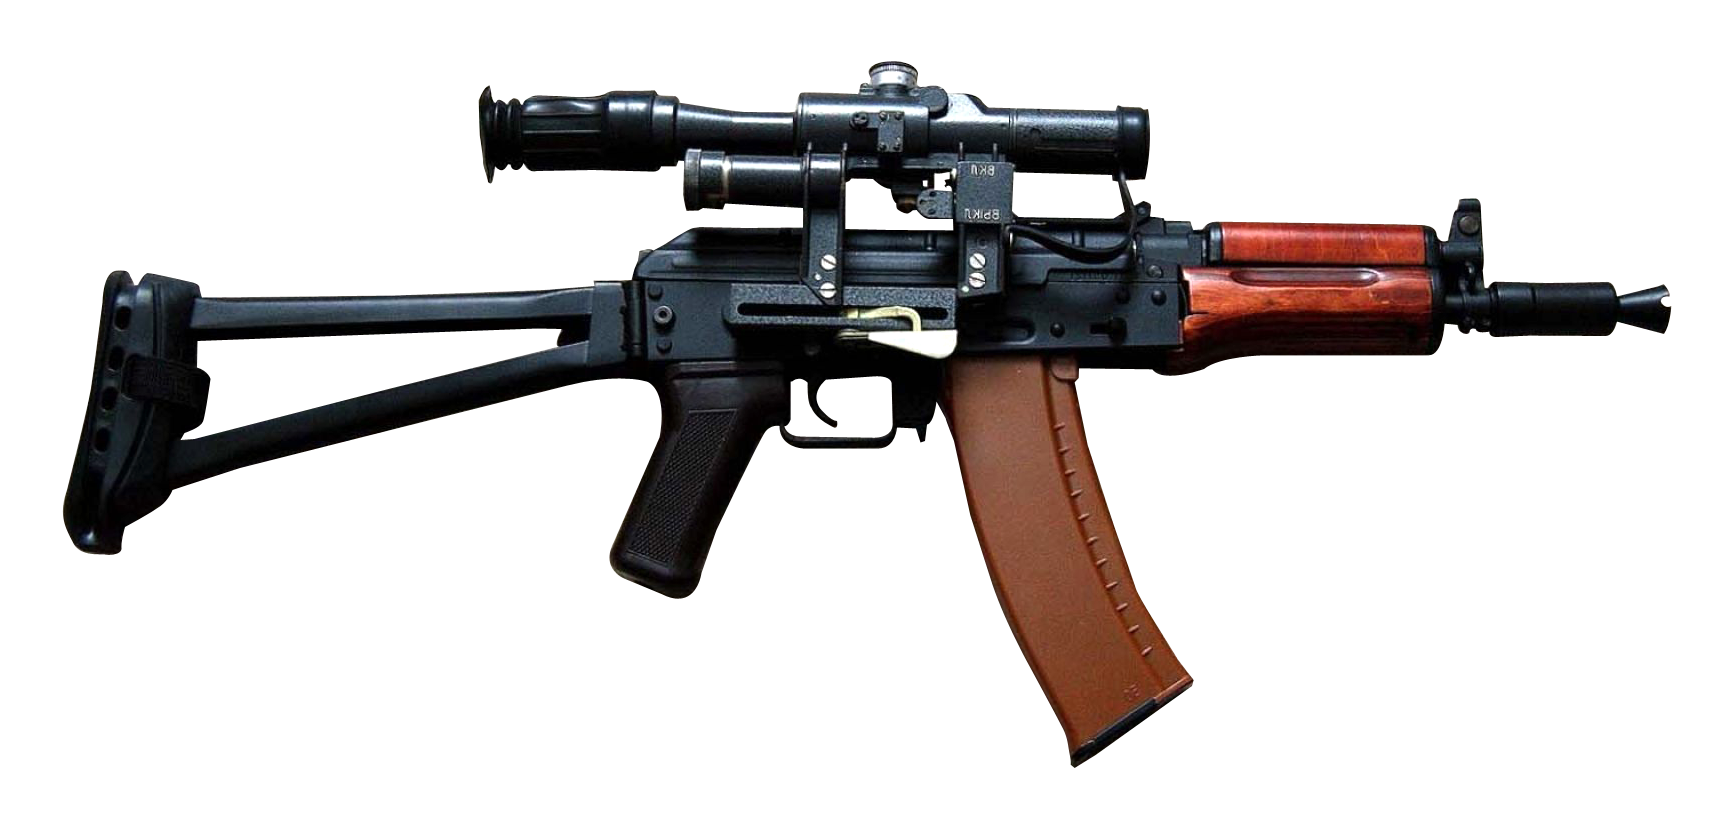 PNG HD Gun - 155054